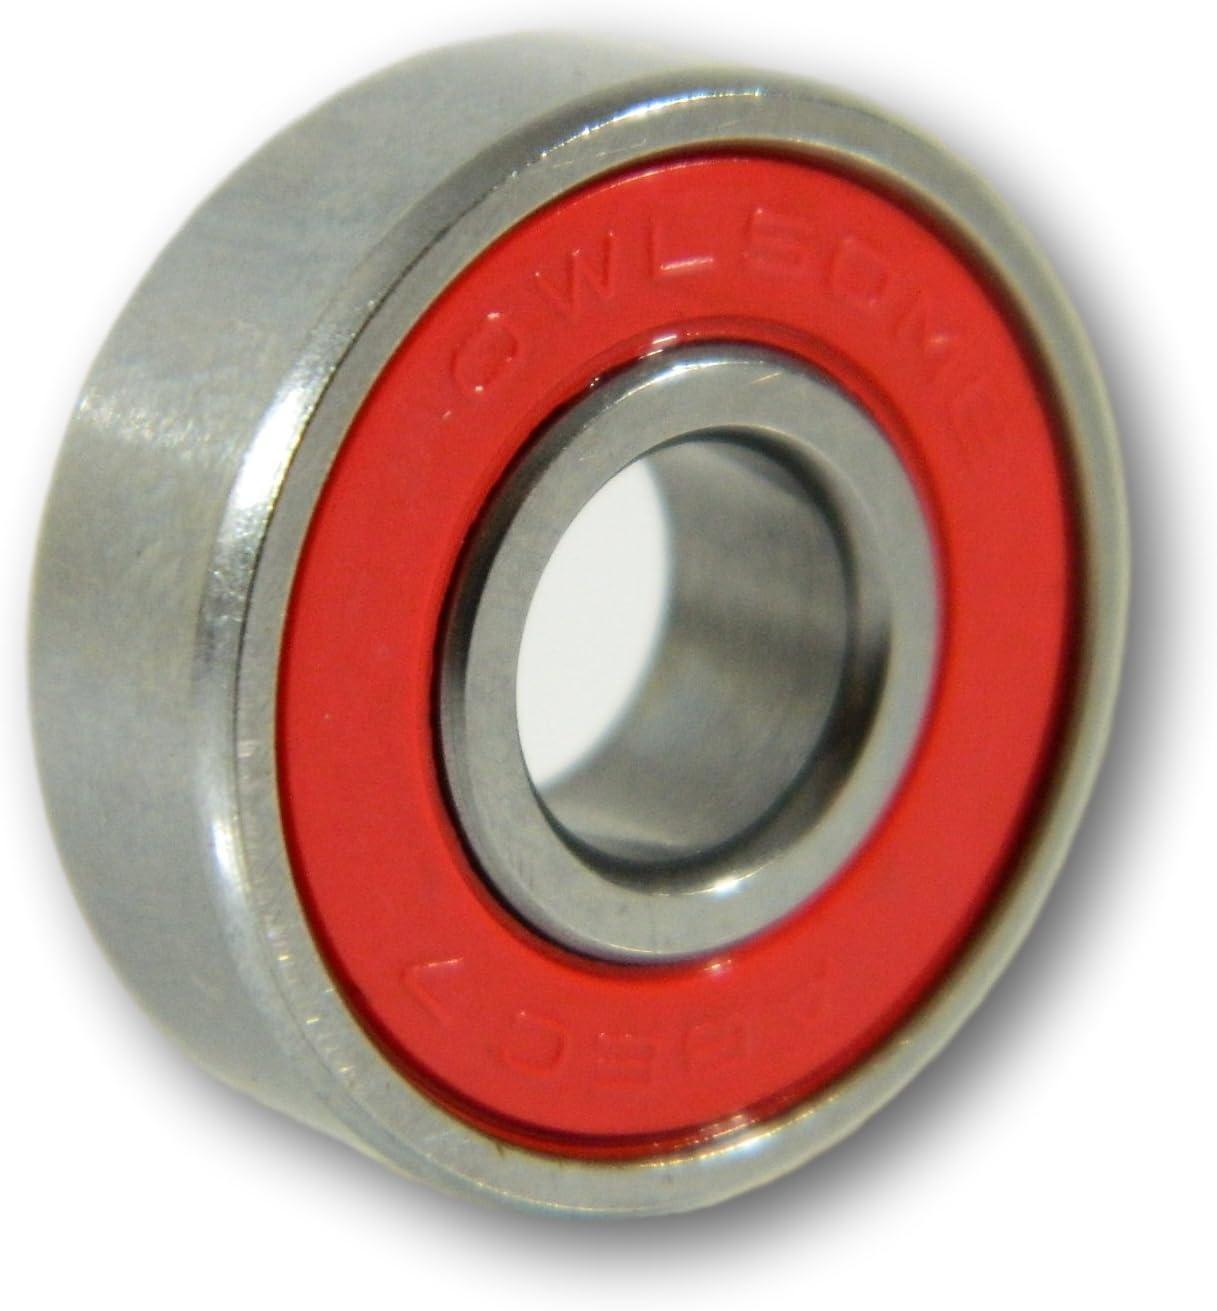 Blank 65mm 82a Neon Orange Cruiser Wheels Owlsome Precison ABEC 7 Bearings